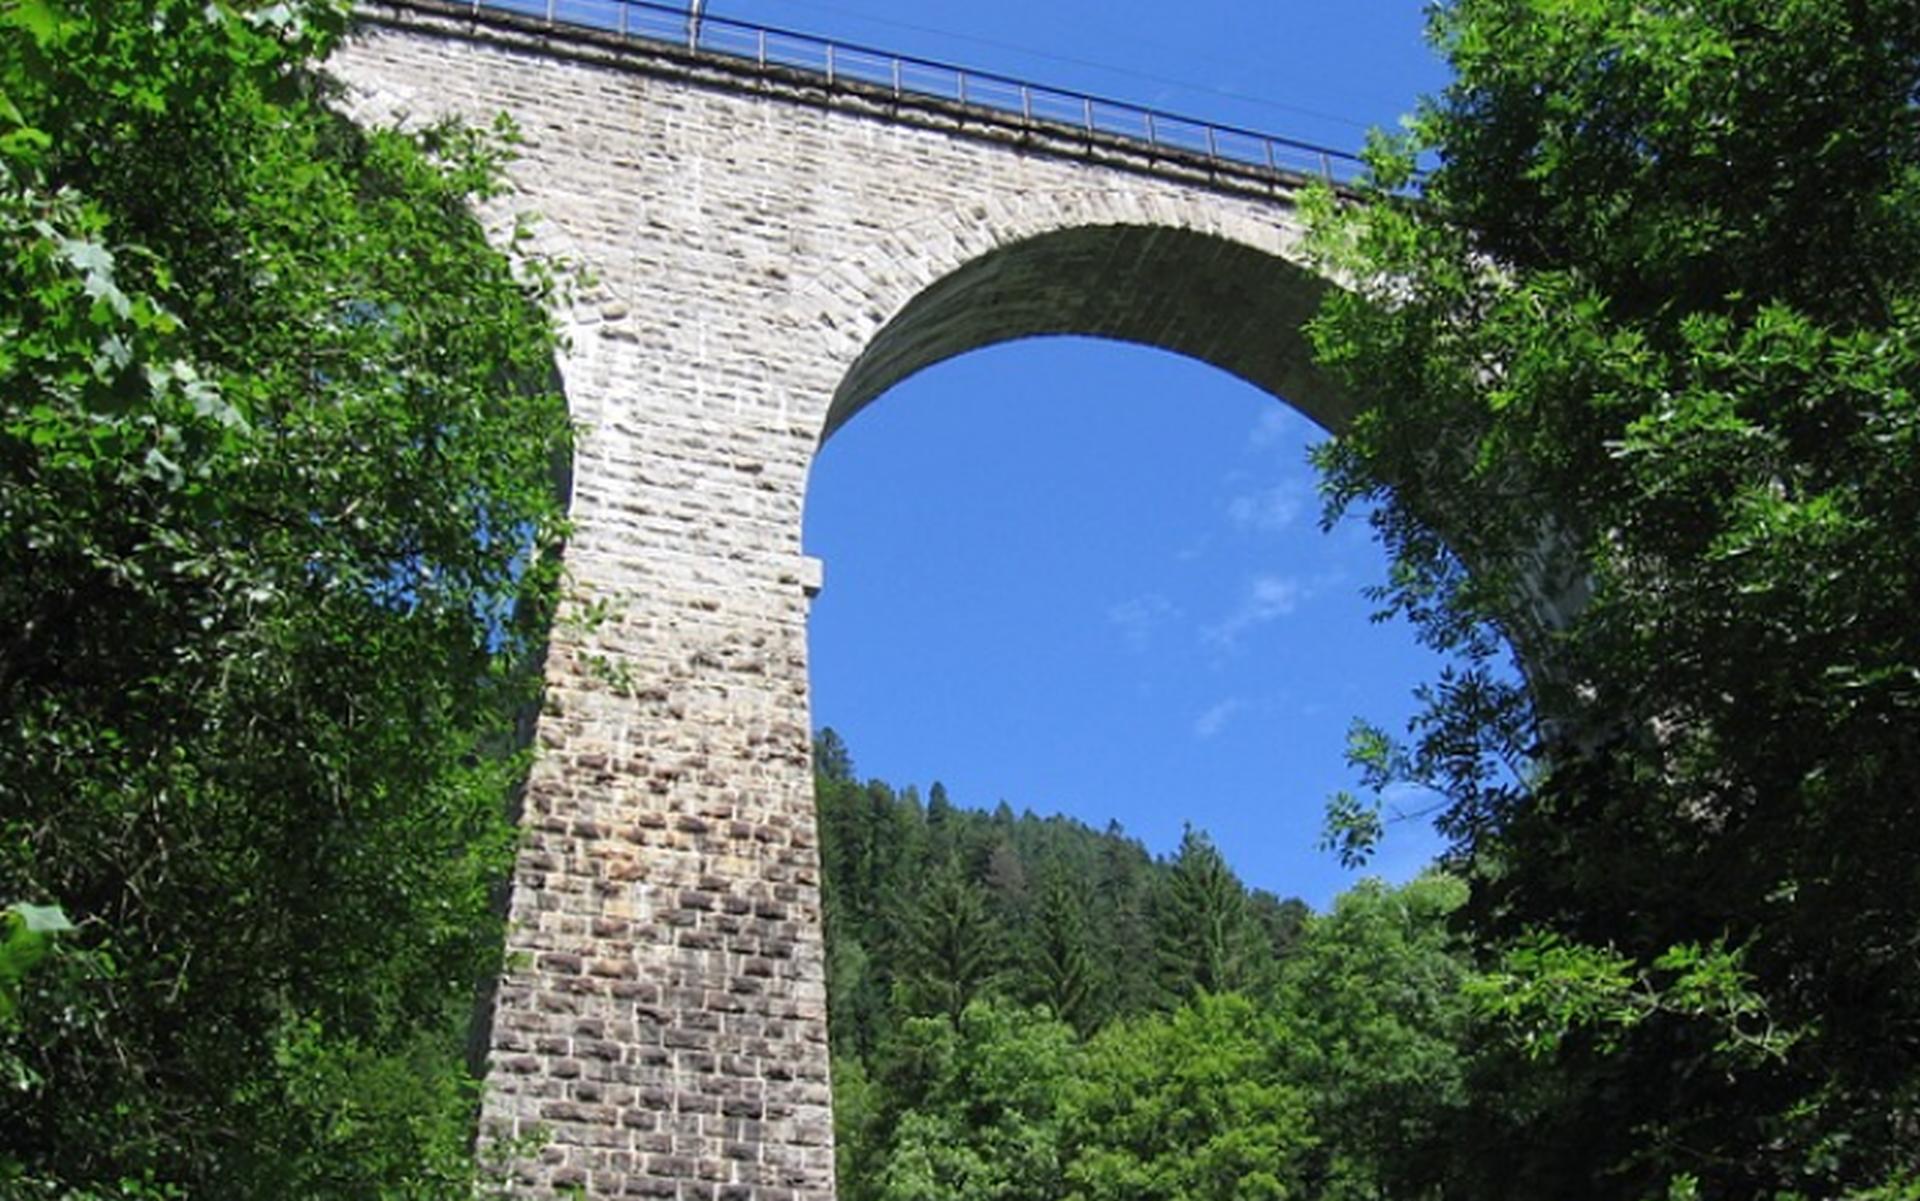 Viadukt u predstečajnom postupku